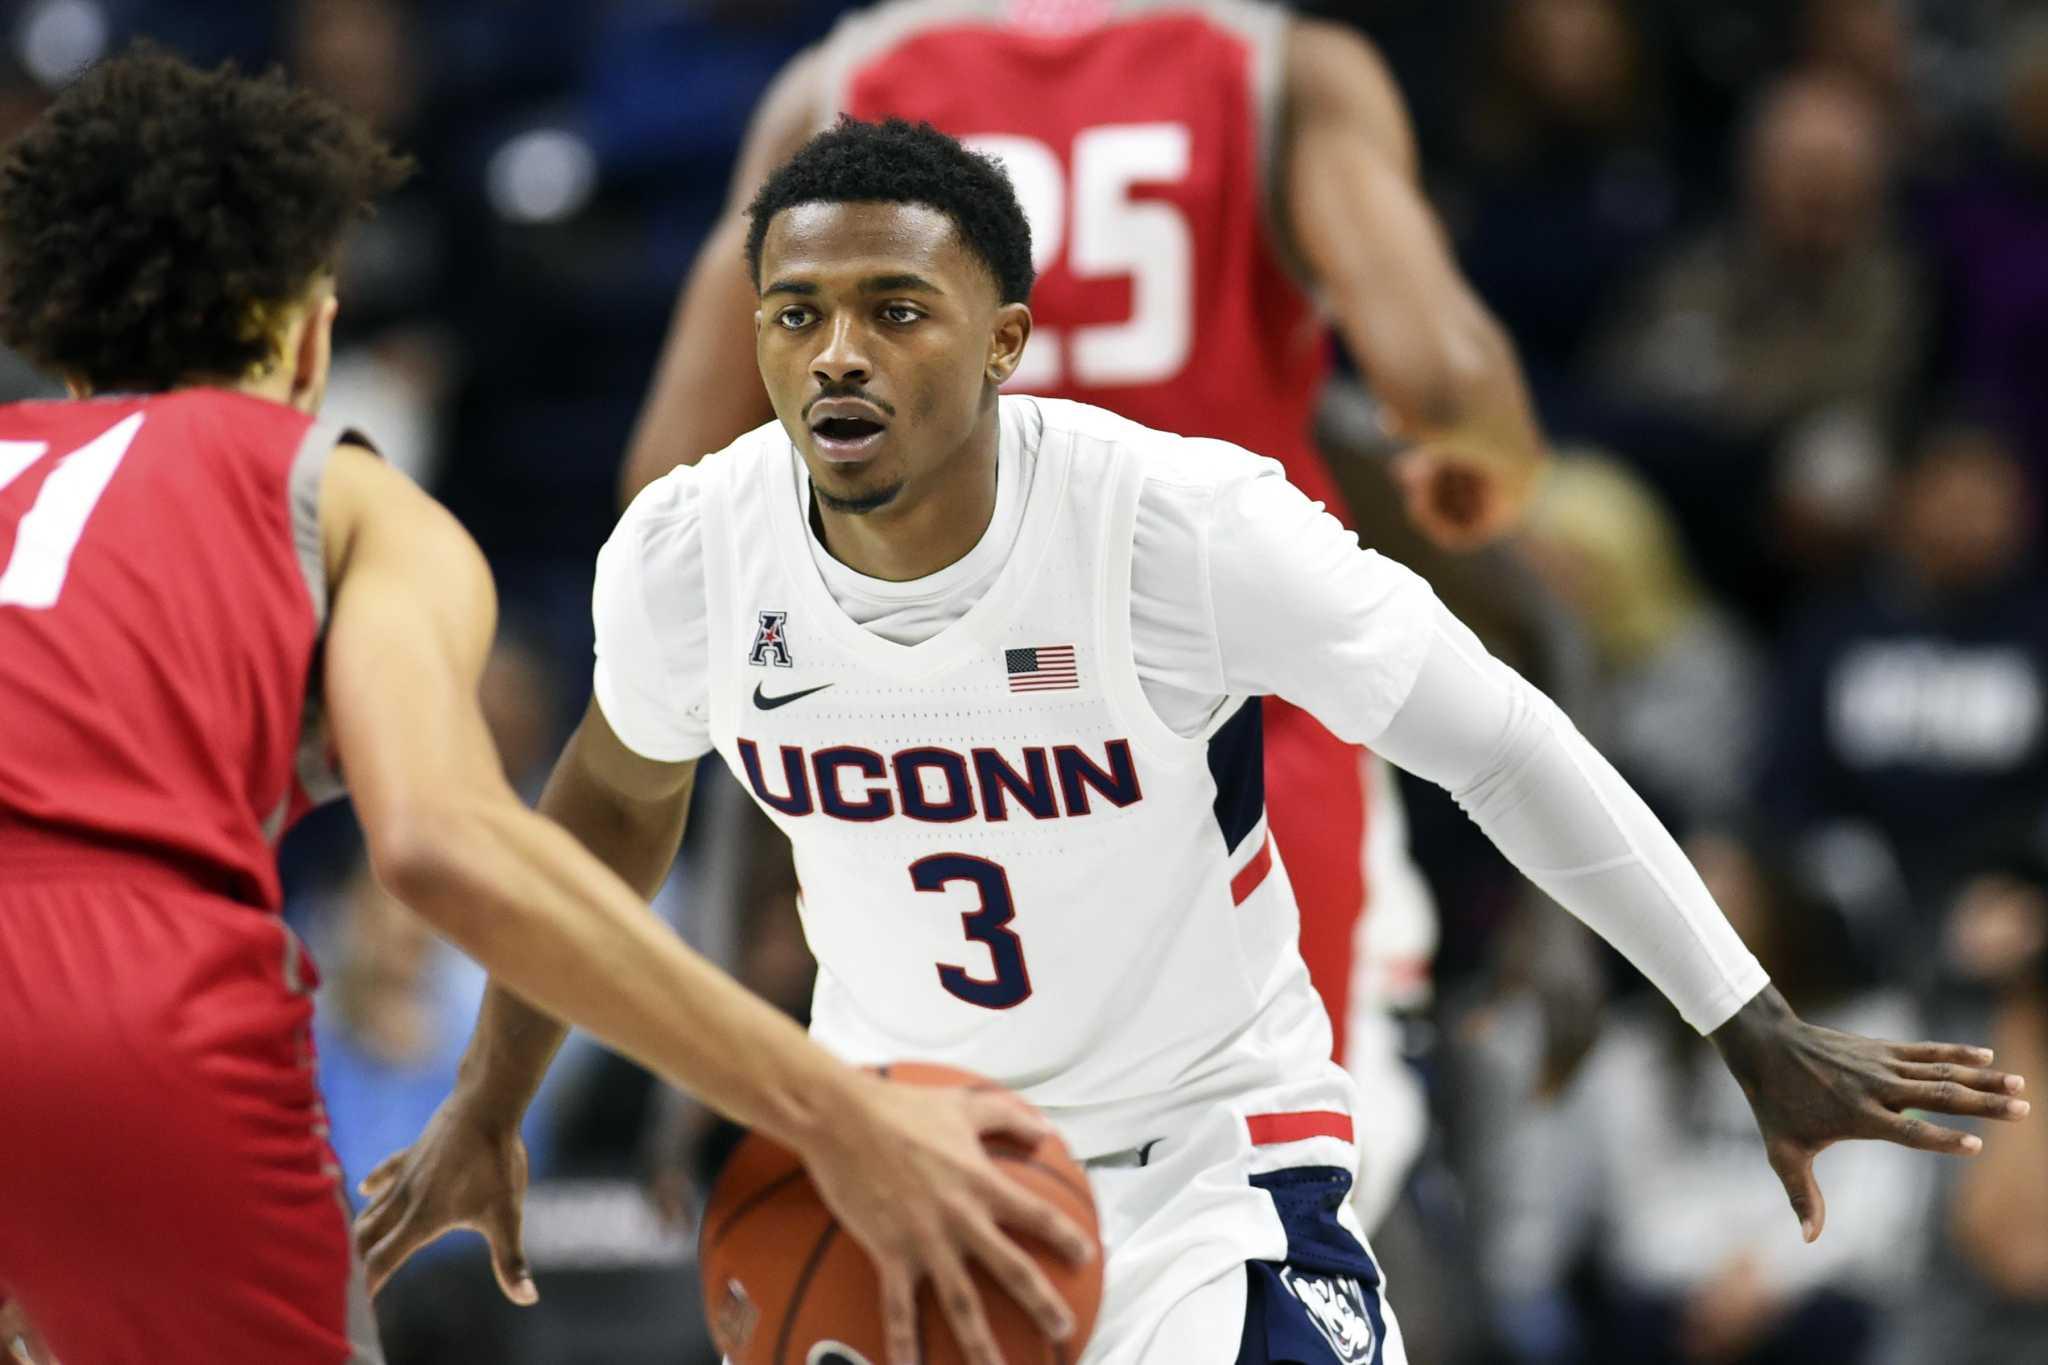 Men's basketball gameday: No. 15 Florida at UConn